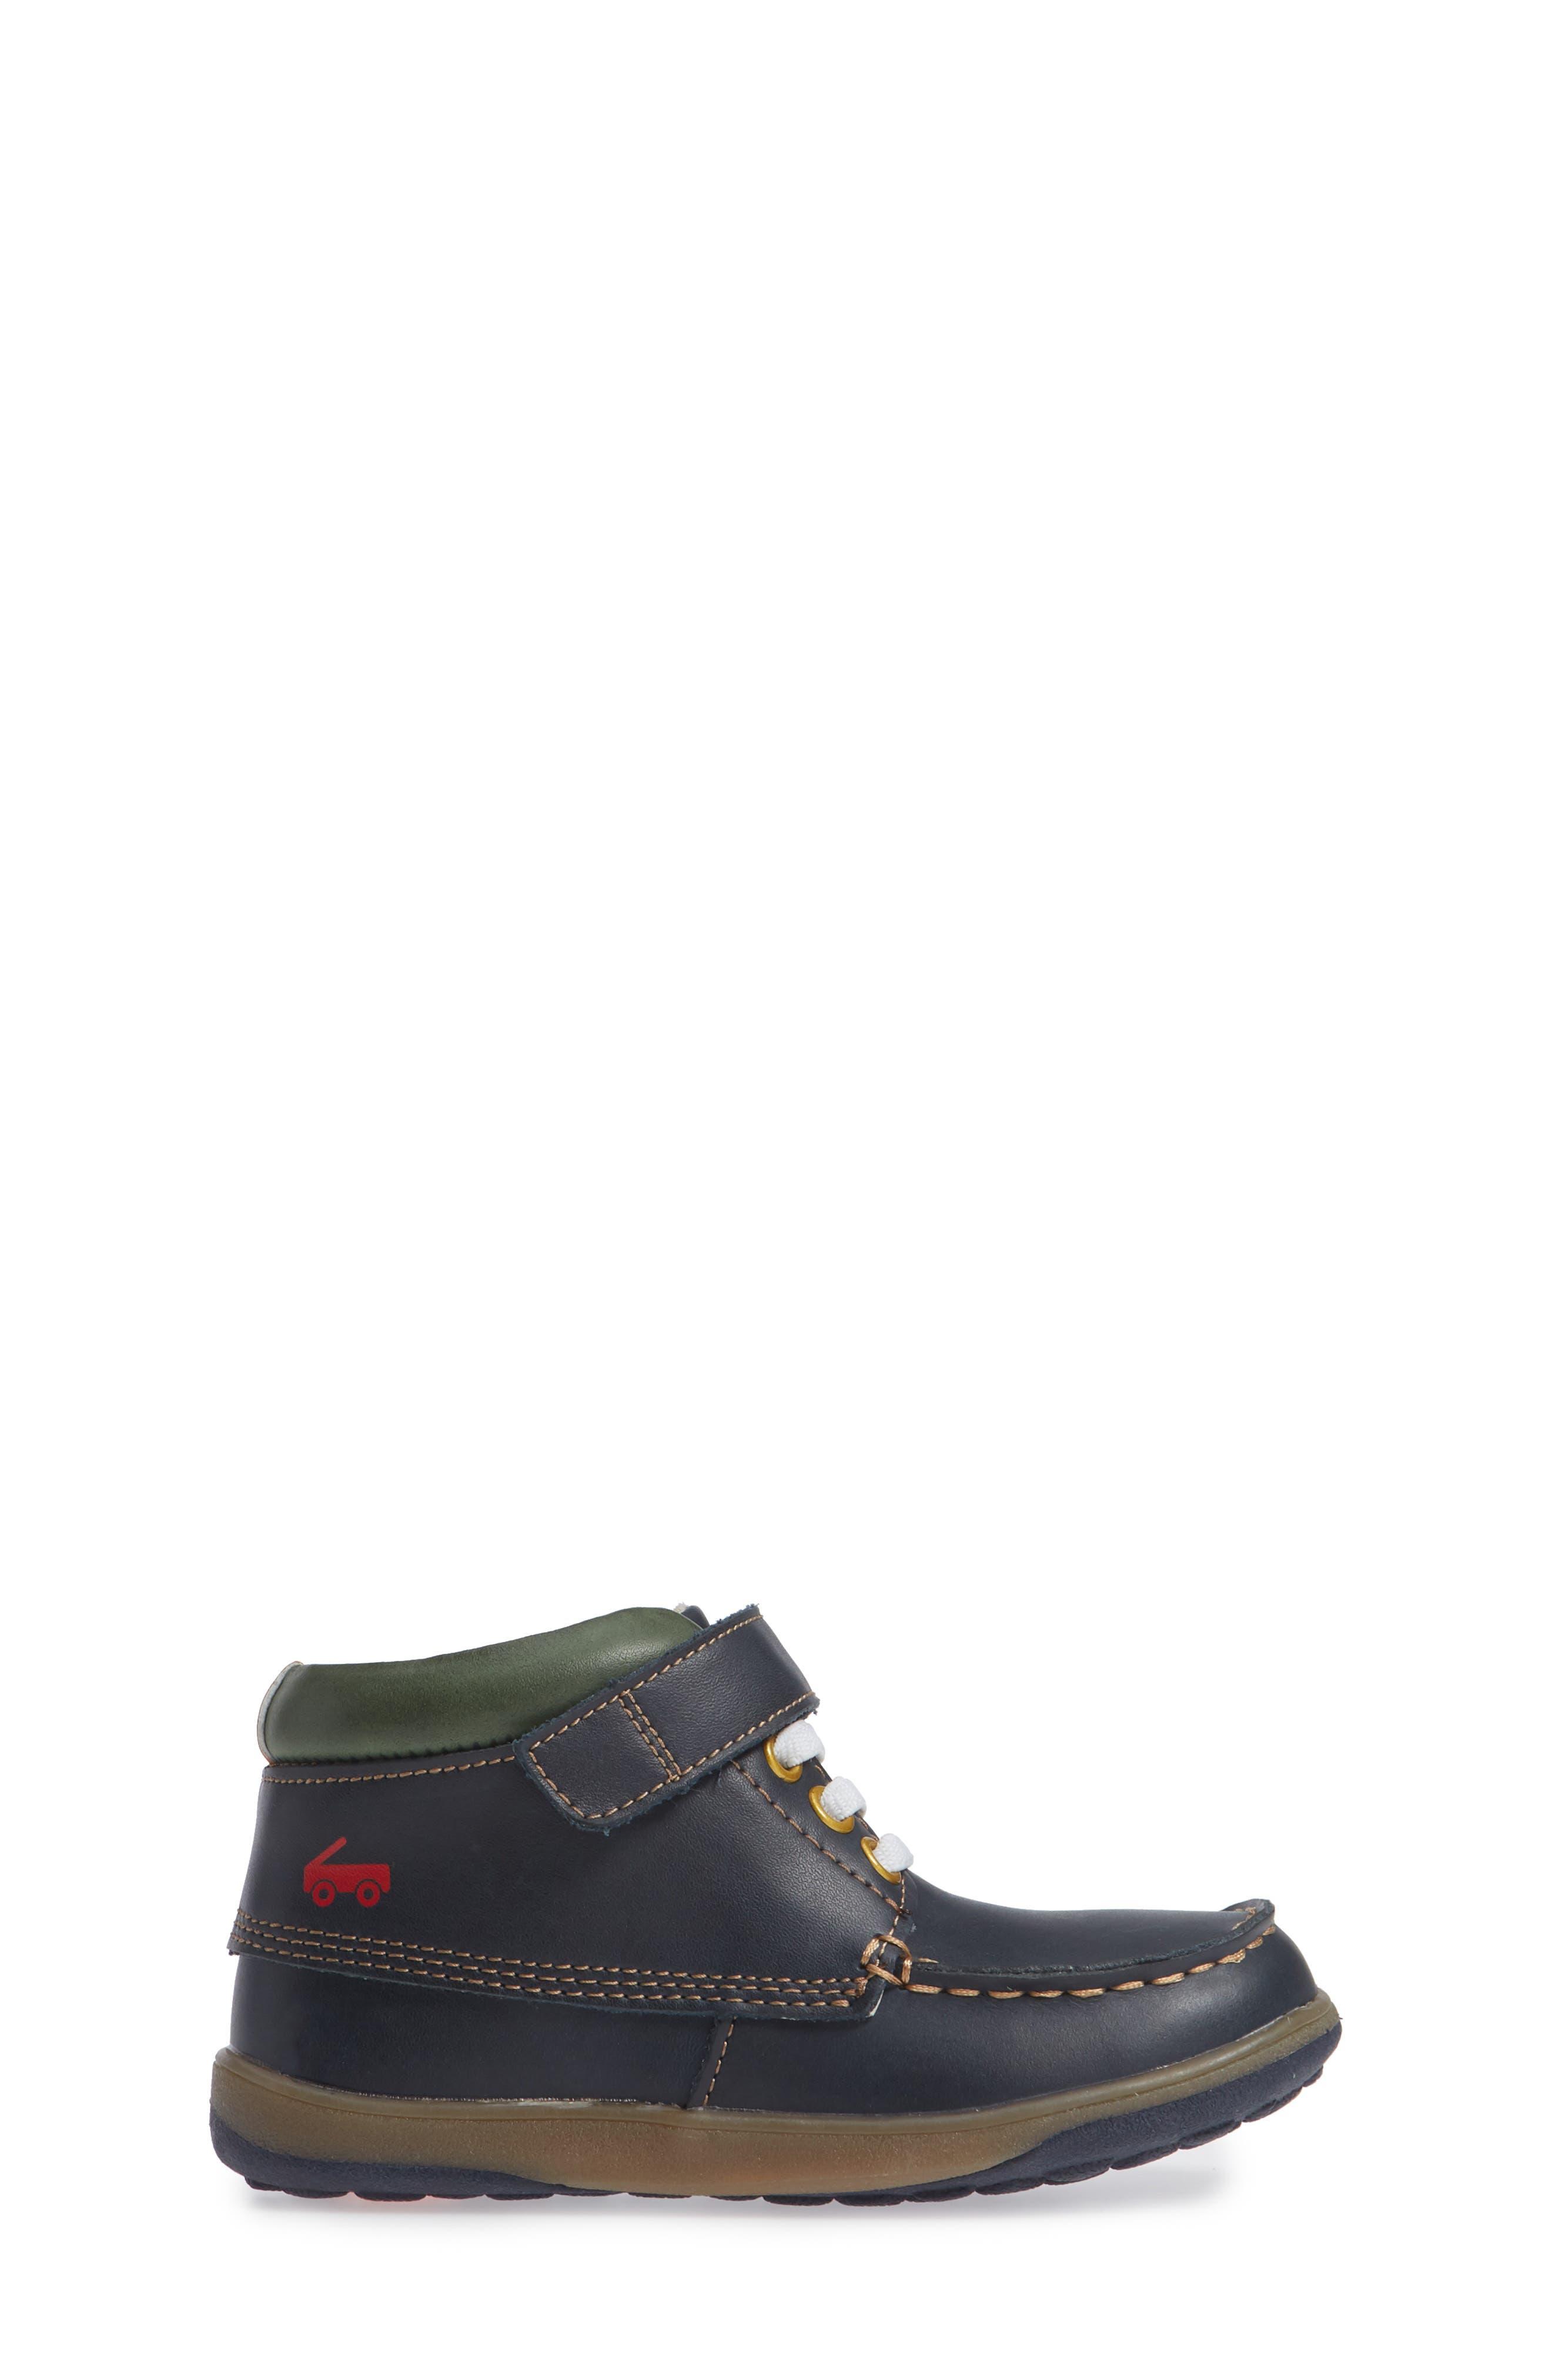 Owen High Top Sneaker Bootie,                             Alternate thumbnail 3, color,                             Navy